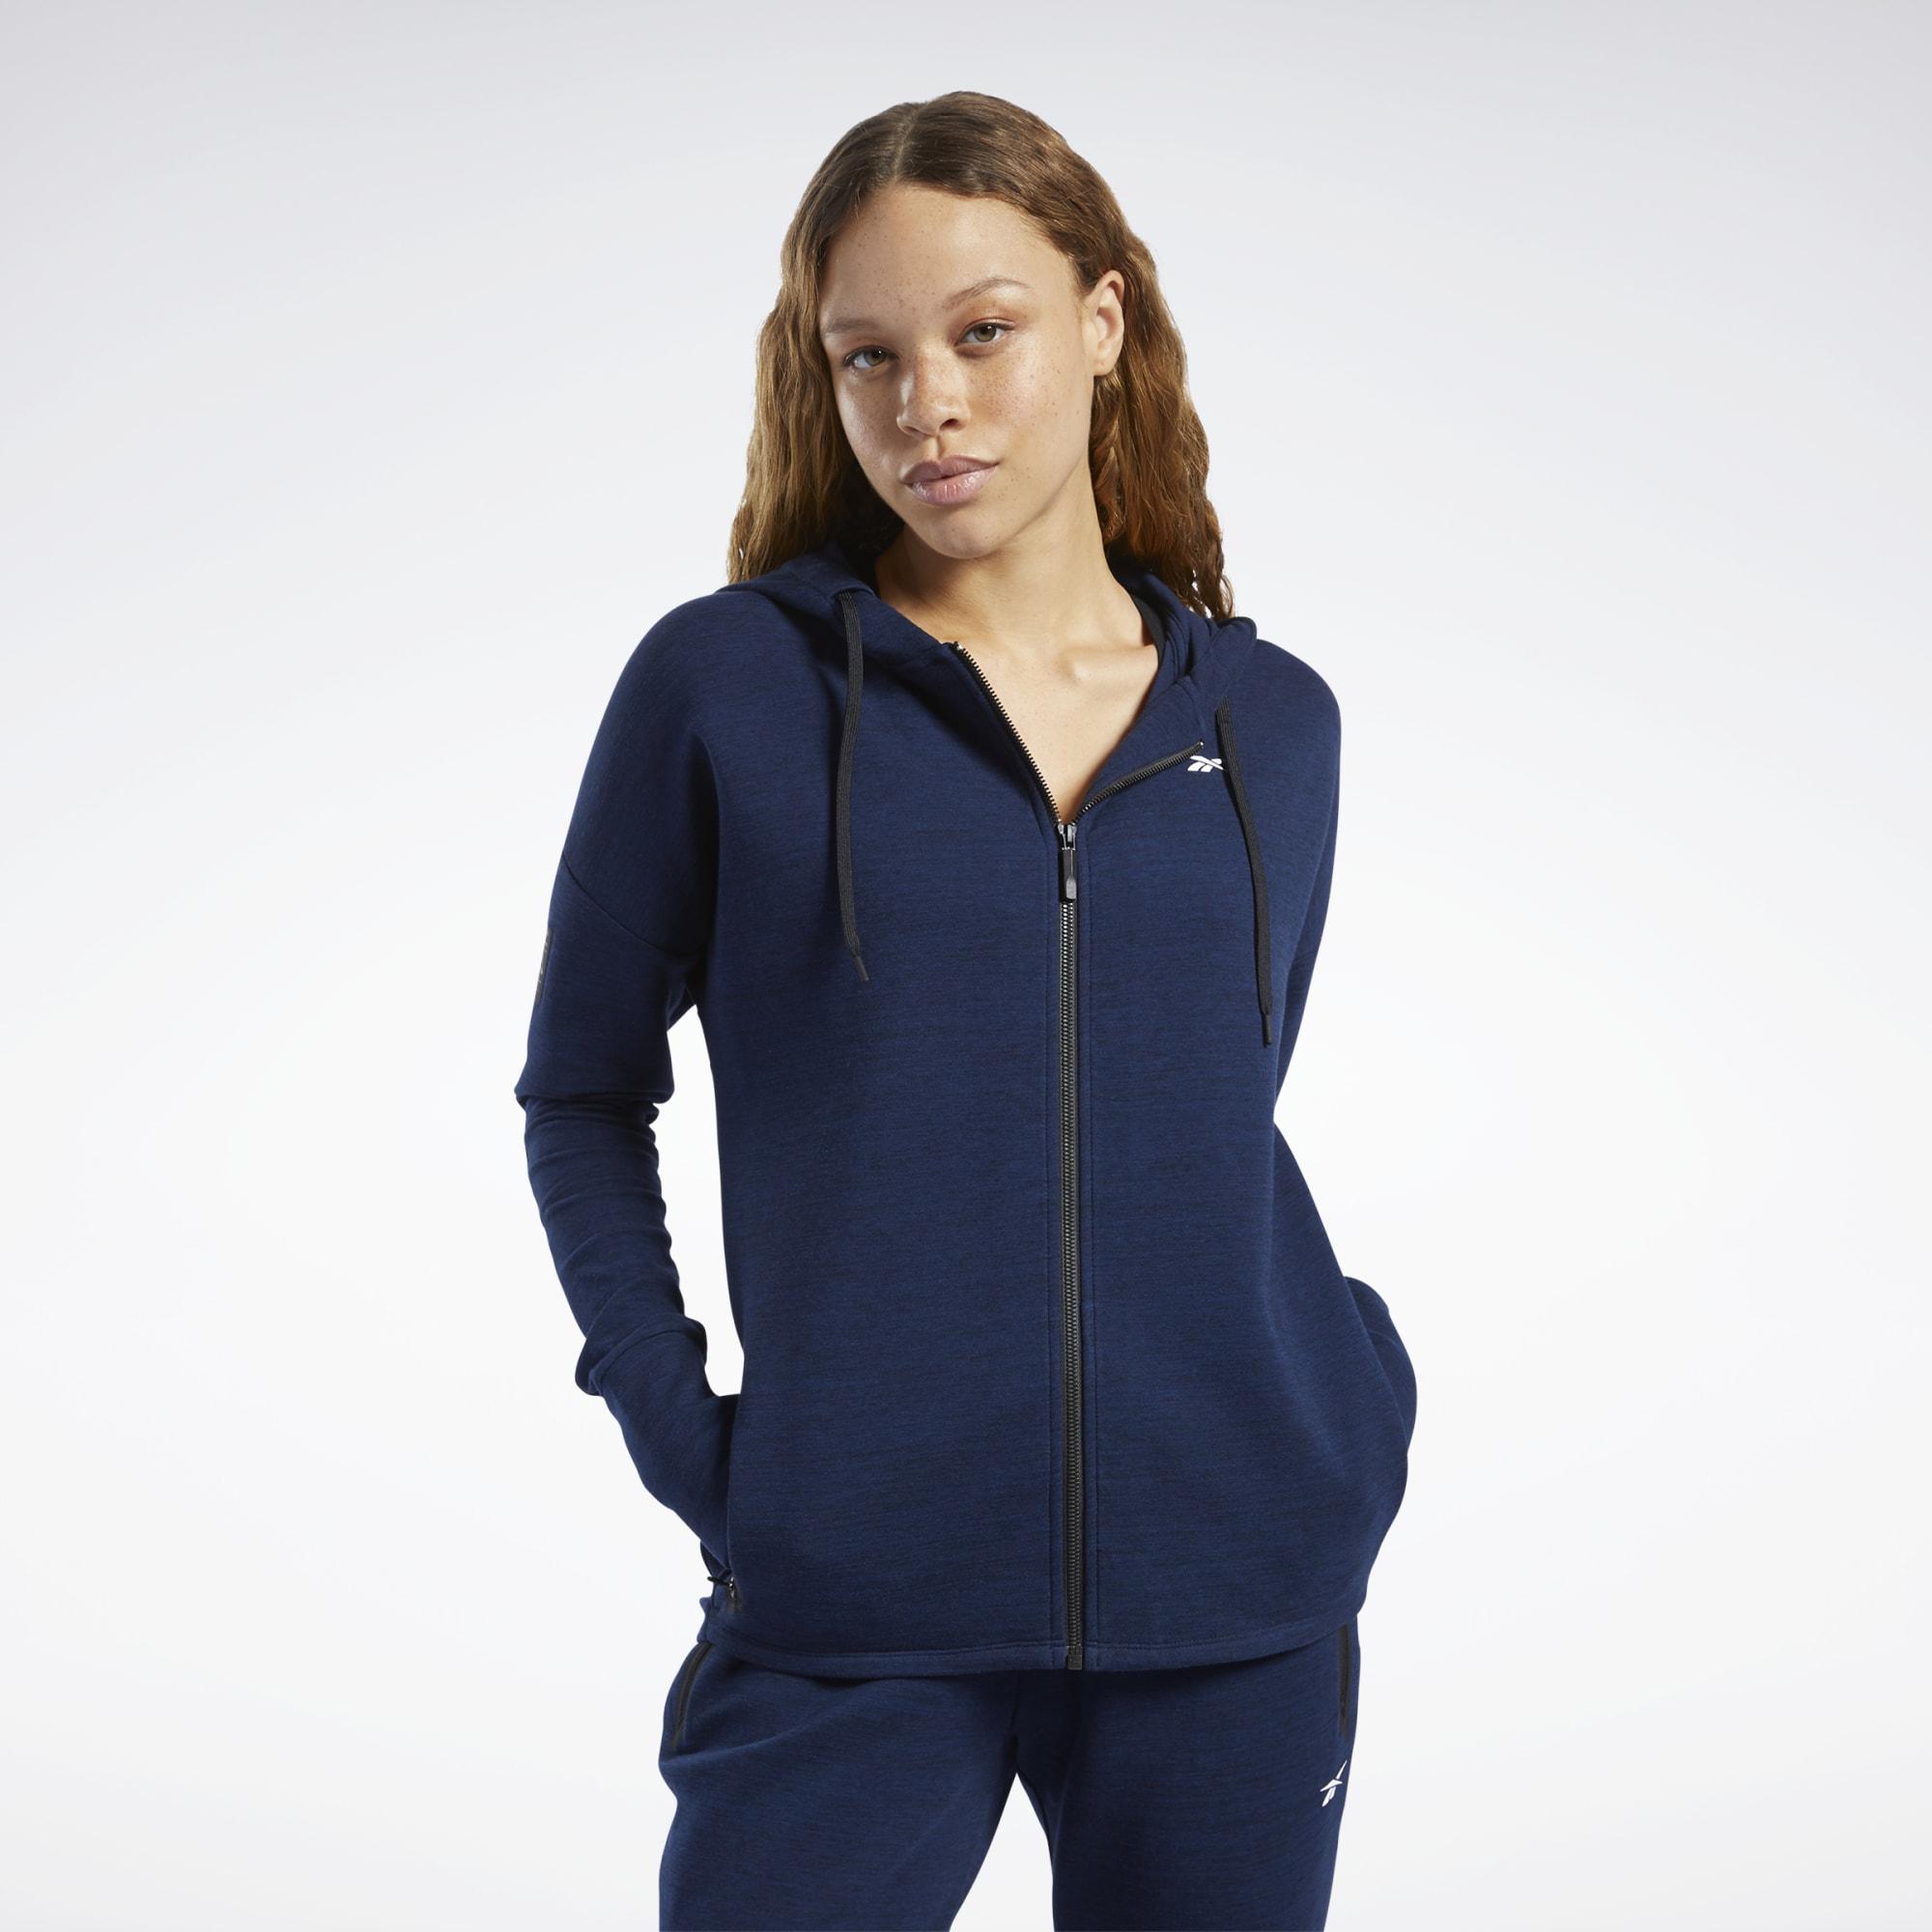 Худи United by Fitness Doubleknit Full-Zip